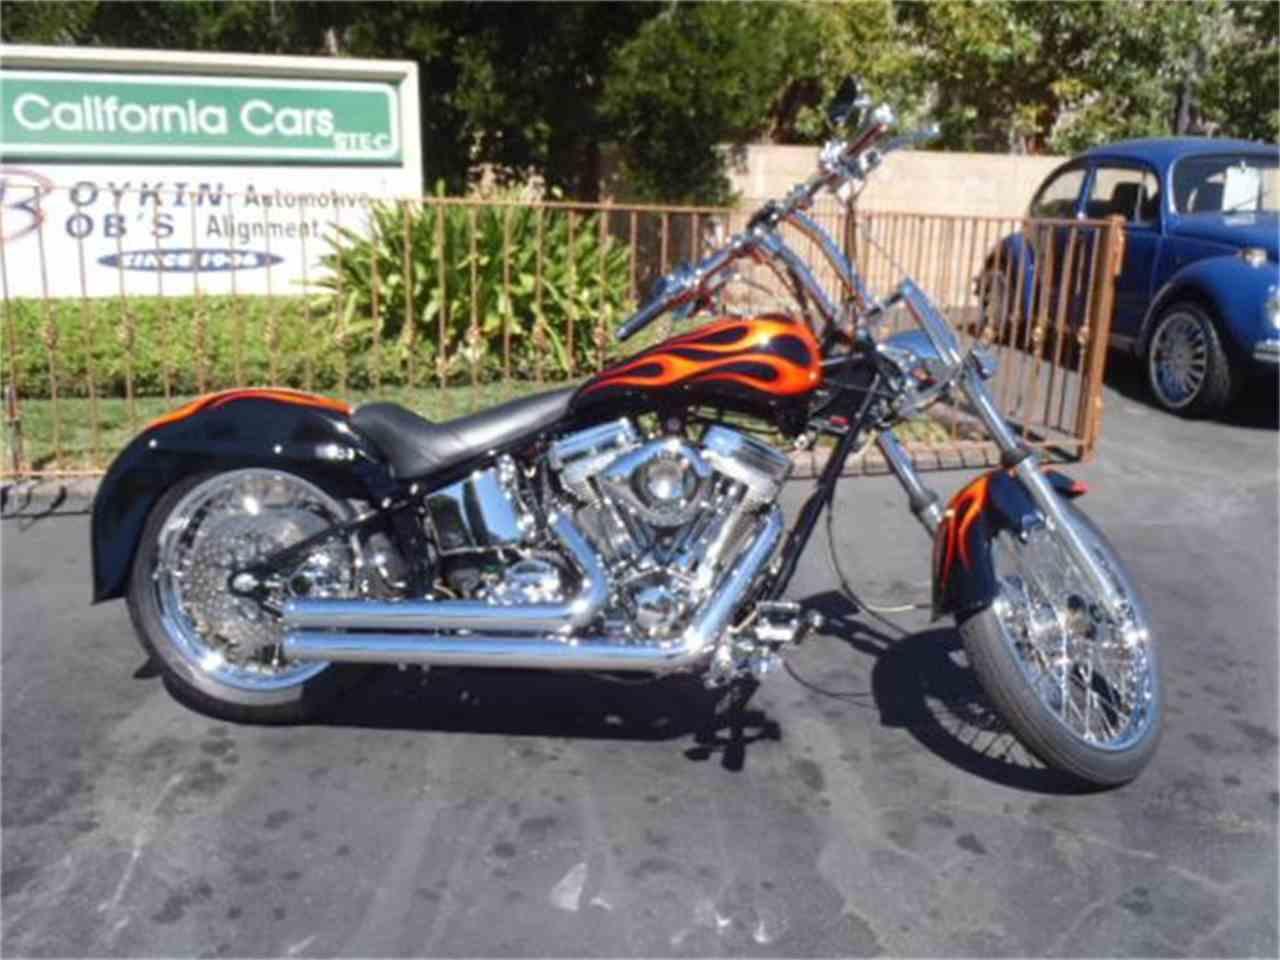 Custom Choppers California - 0425